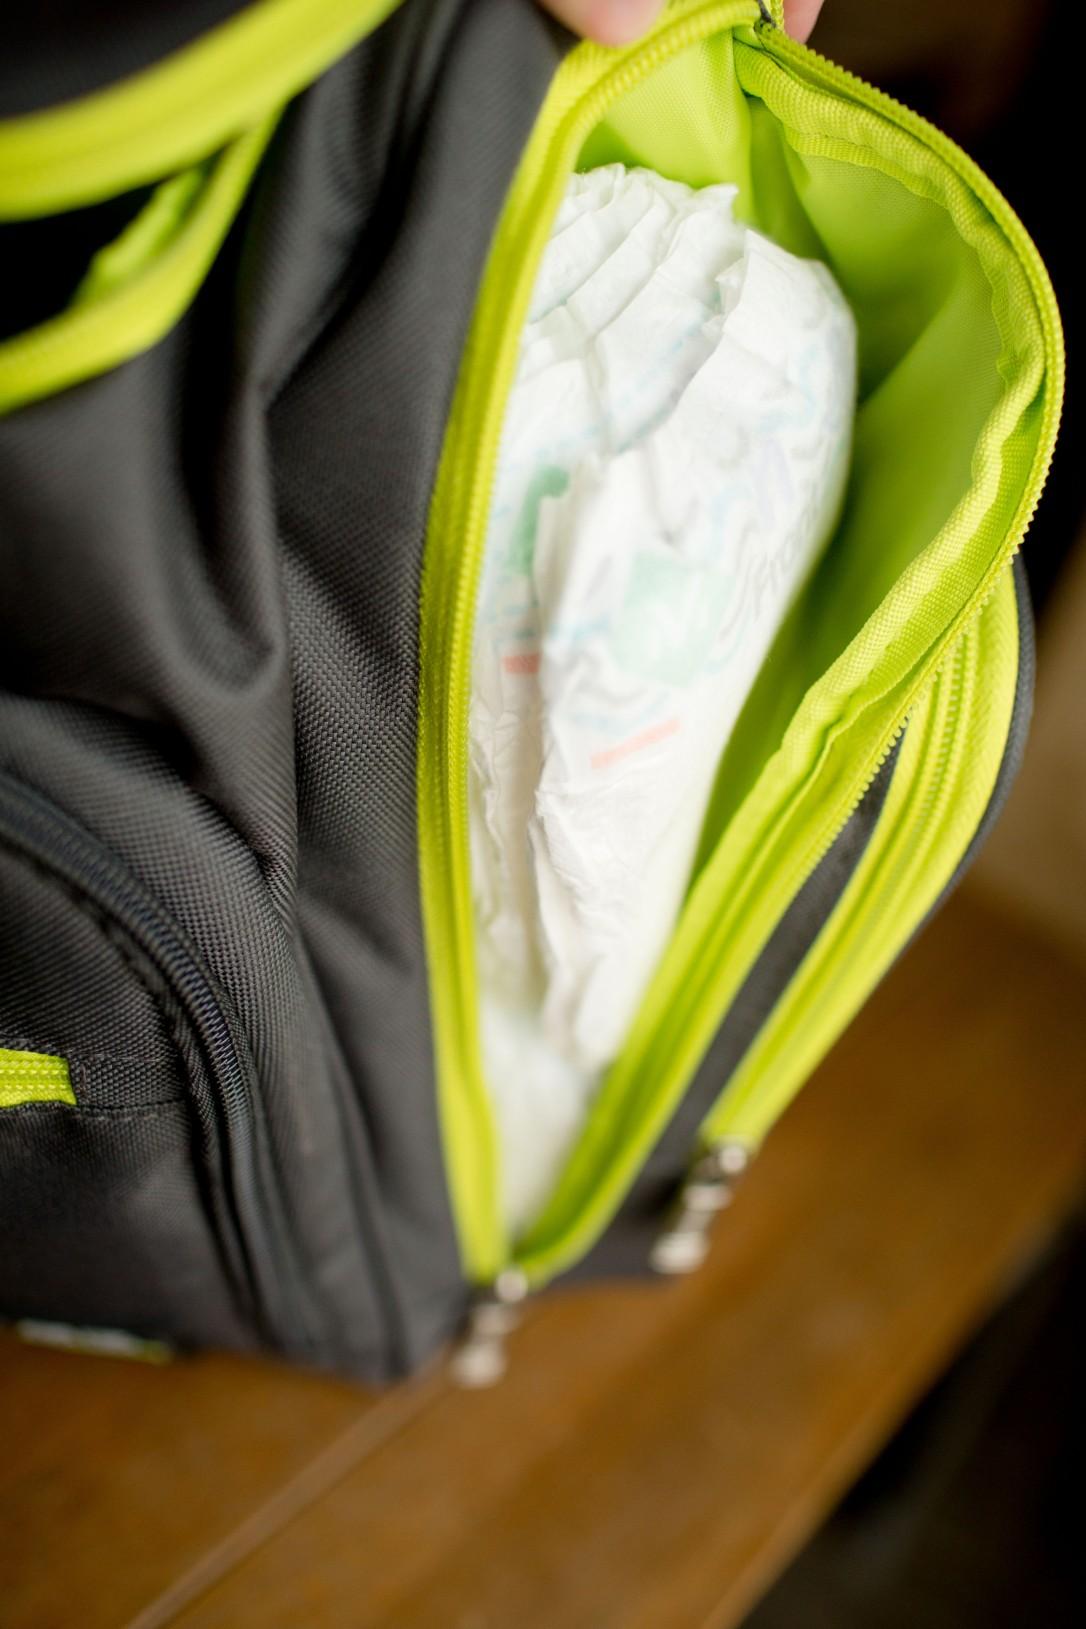 Member's Mark Comfort Care Baby Diapers, Newborn Up to 10 lbs. (108 ct.), Backpack Diaper Bag, Gender Neutral